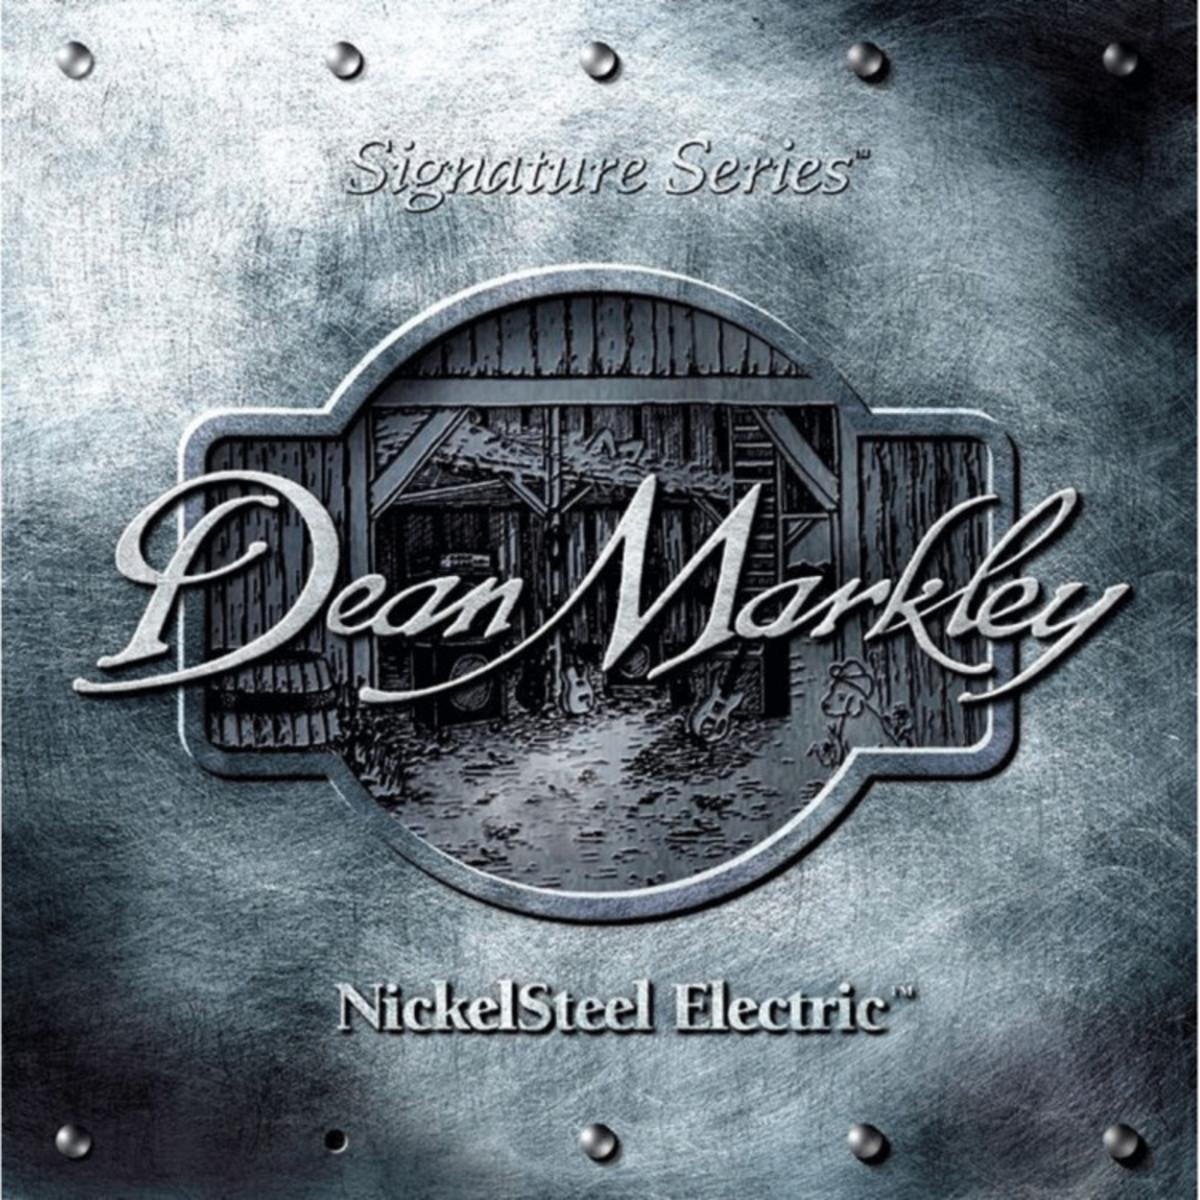 Dean Markley 7 String Electric Signature Guitar Strings